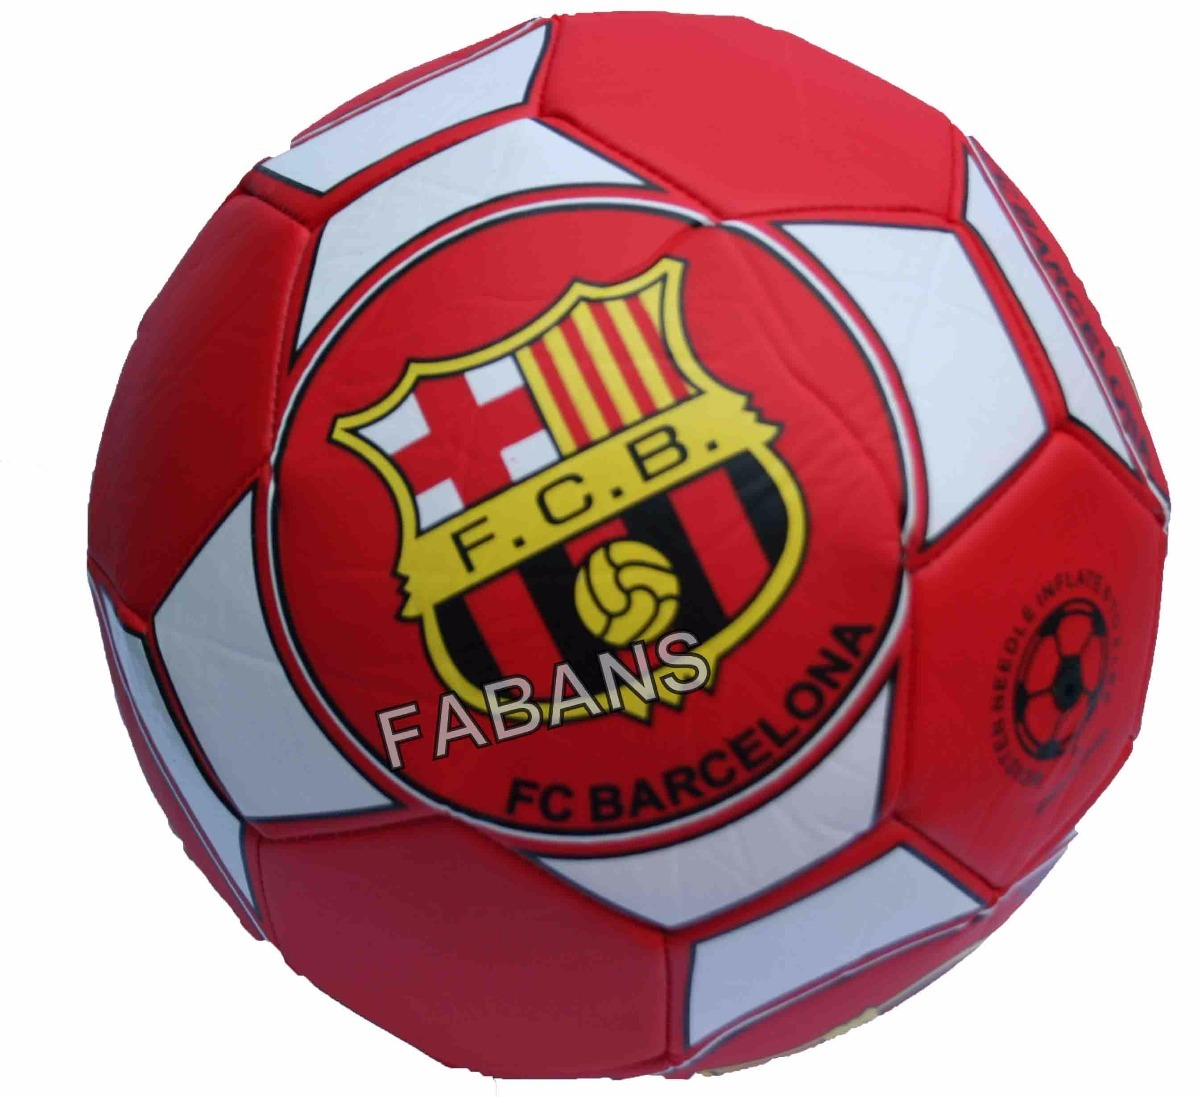 balon de futbol barcelona real madrid pelota juguete niño. Cargando zoom. 59704b3c395